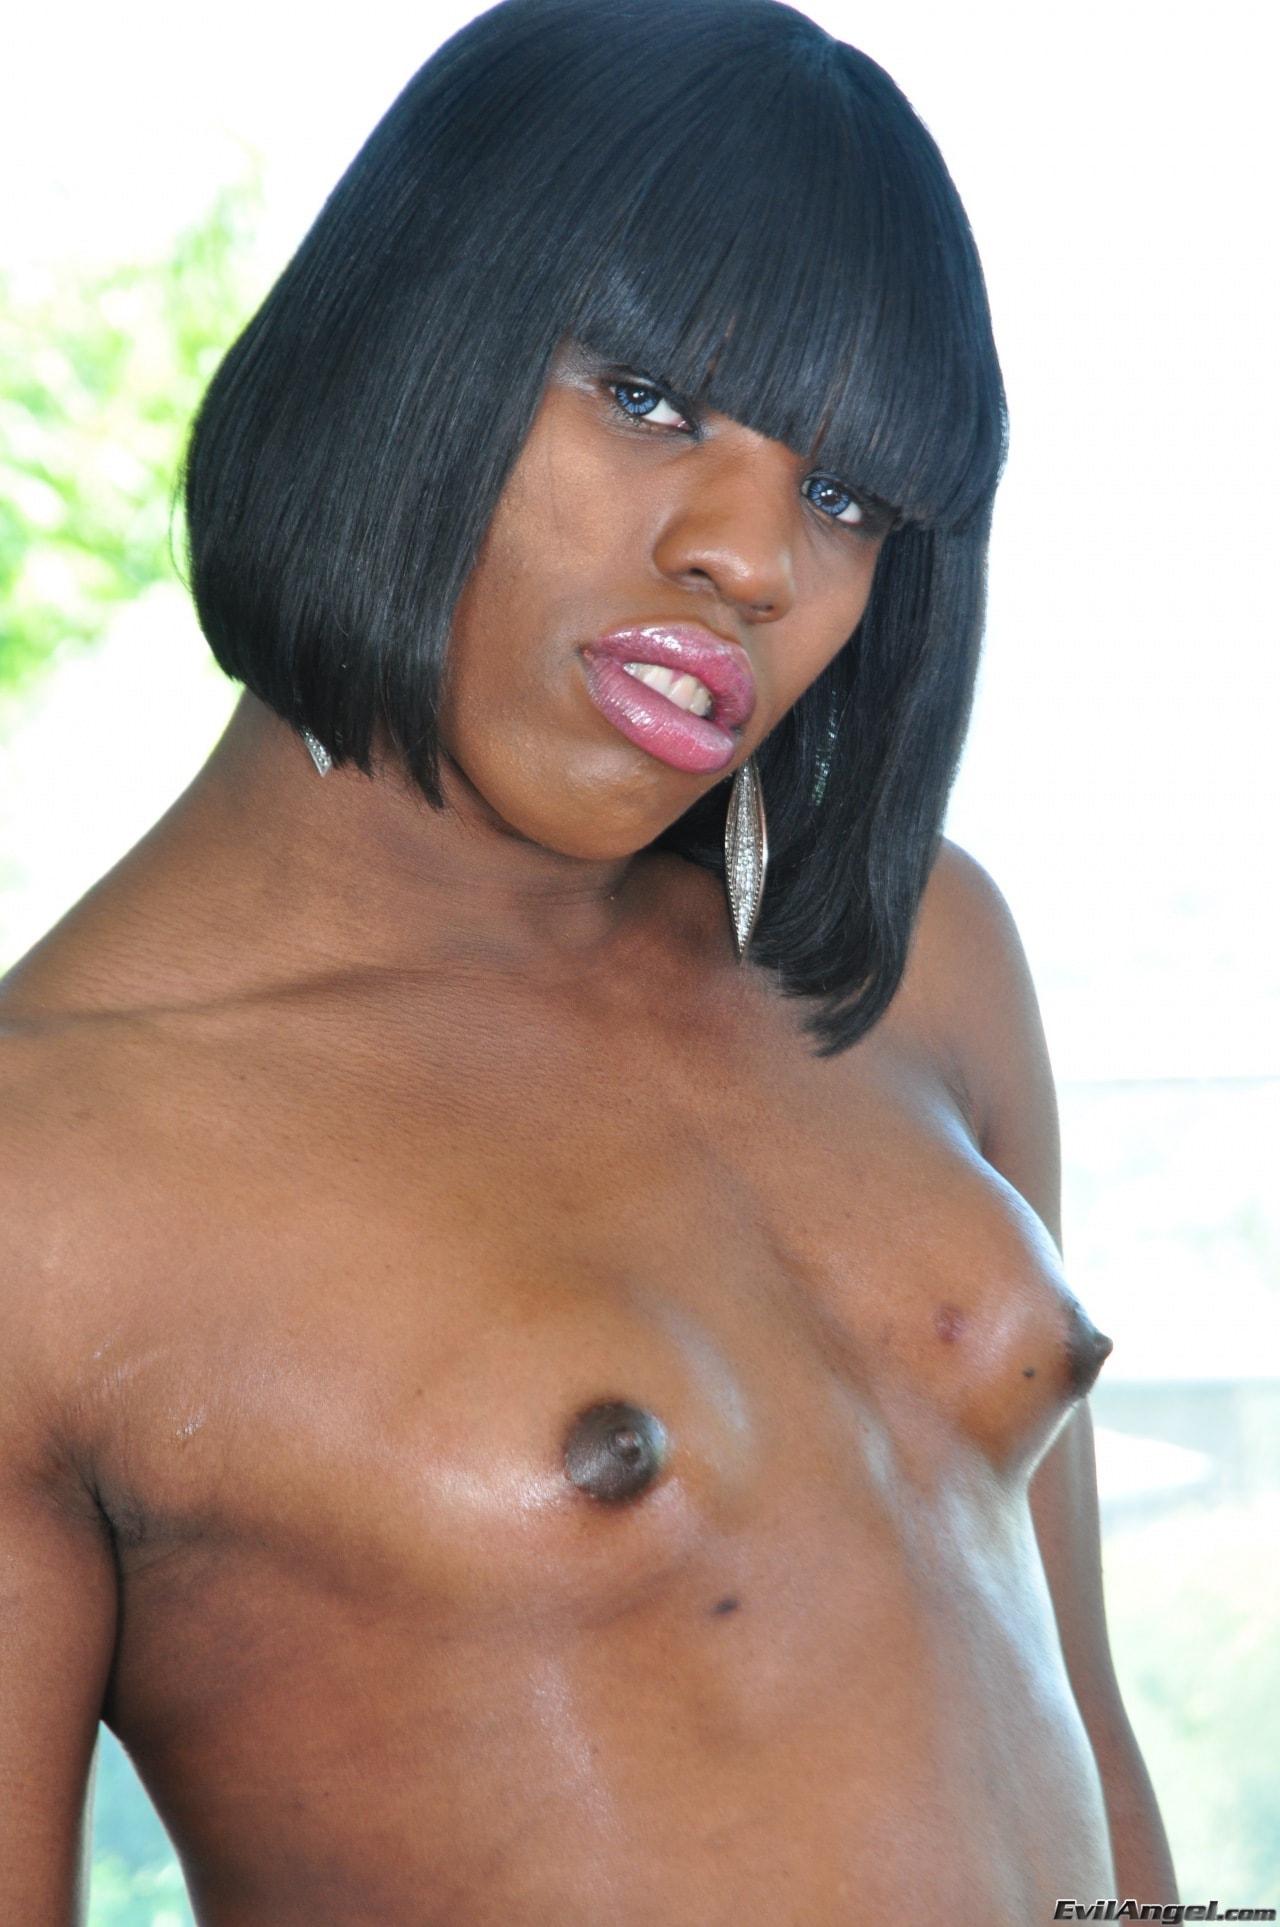 I Love Black Shemales 'Black Shemale Idol - The Auditions 02' starring Naughty Natasha (Photo 25)